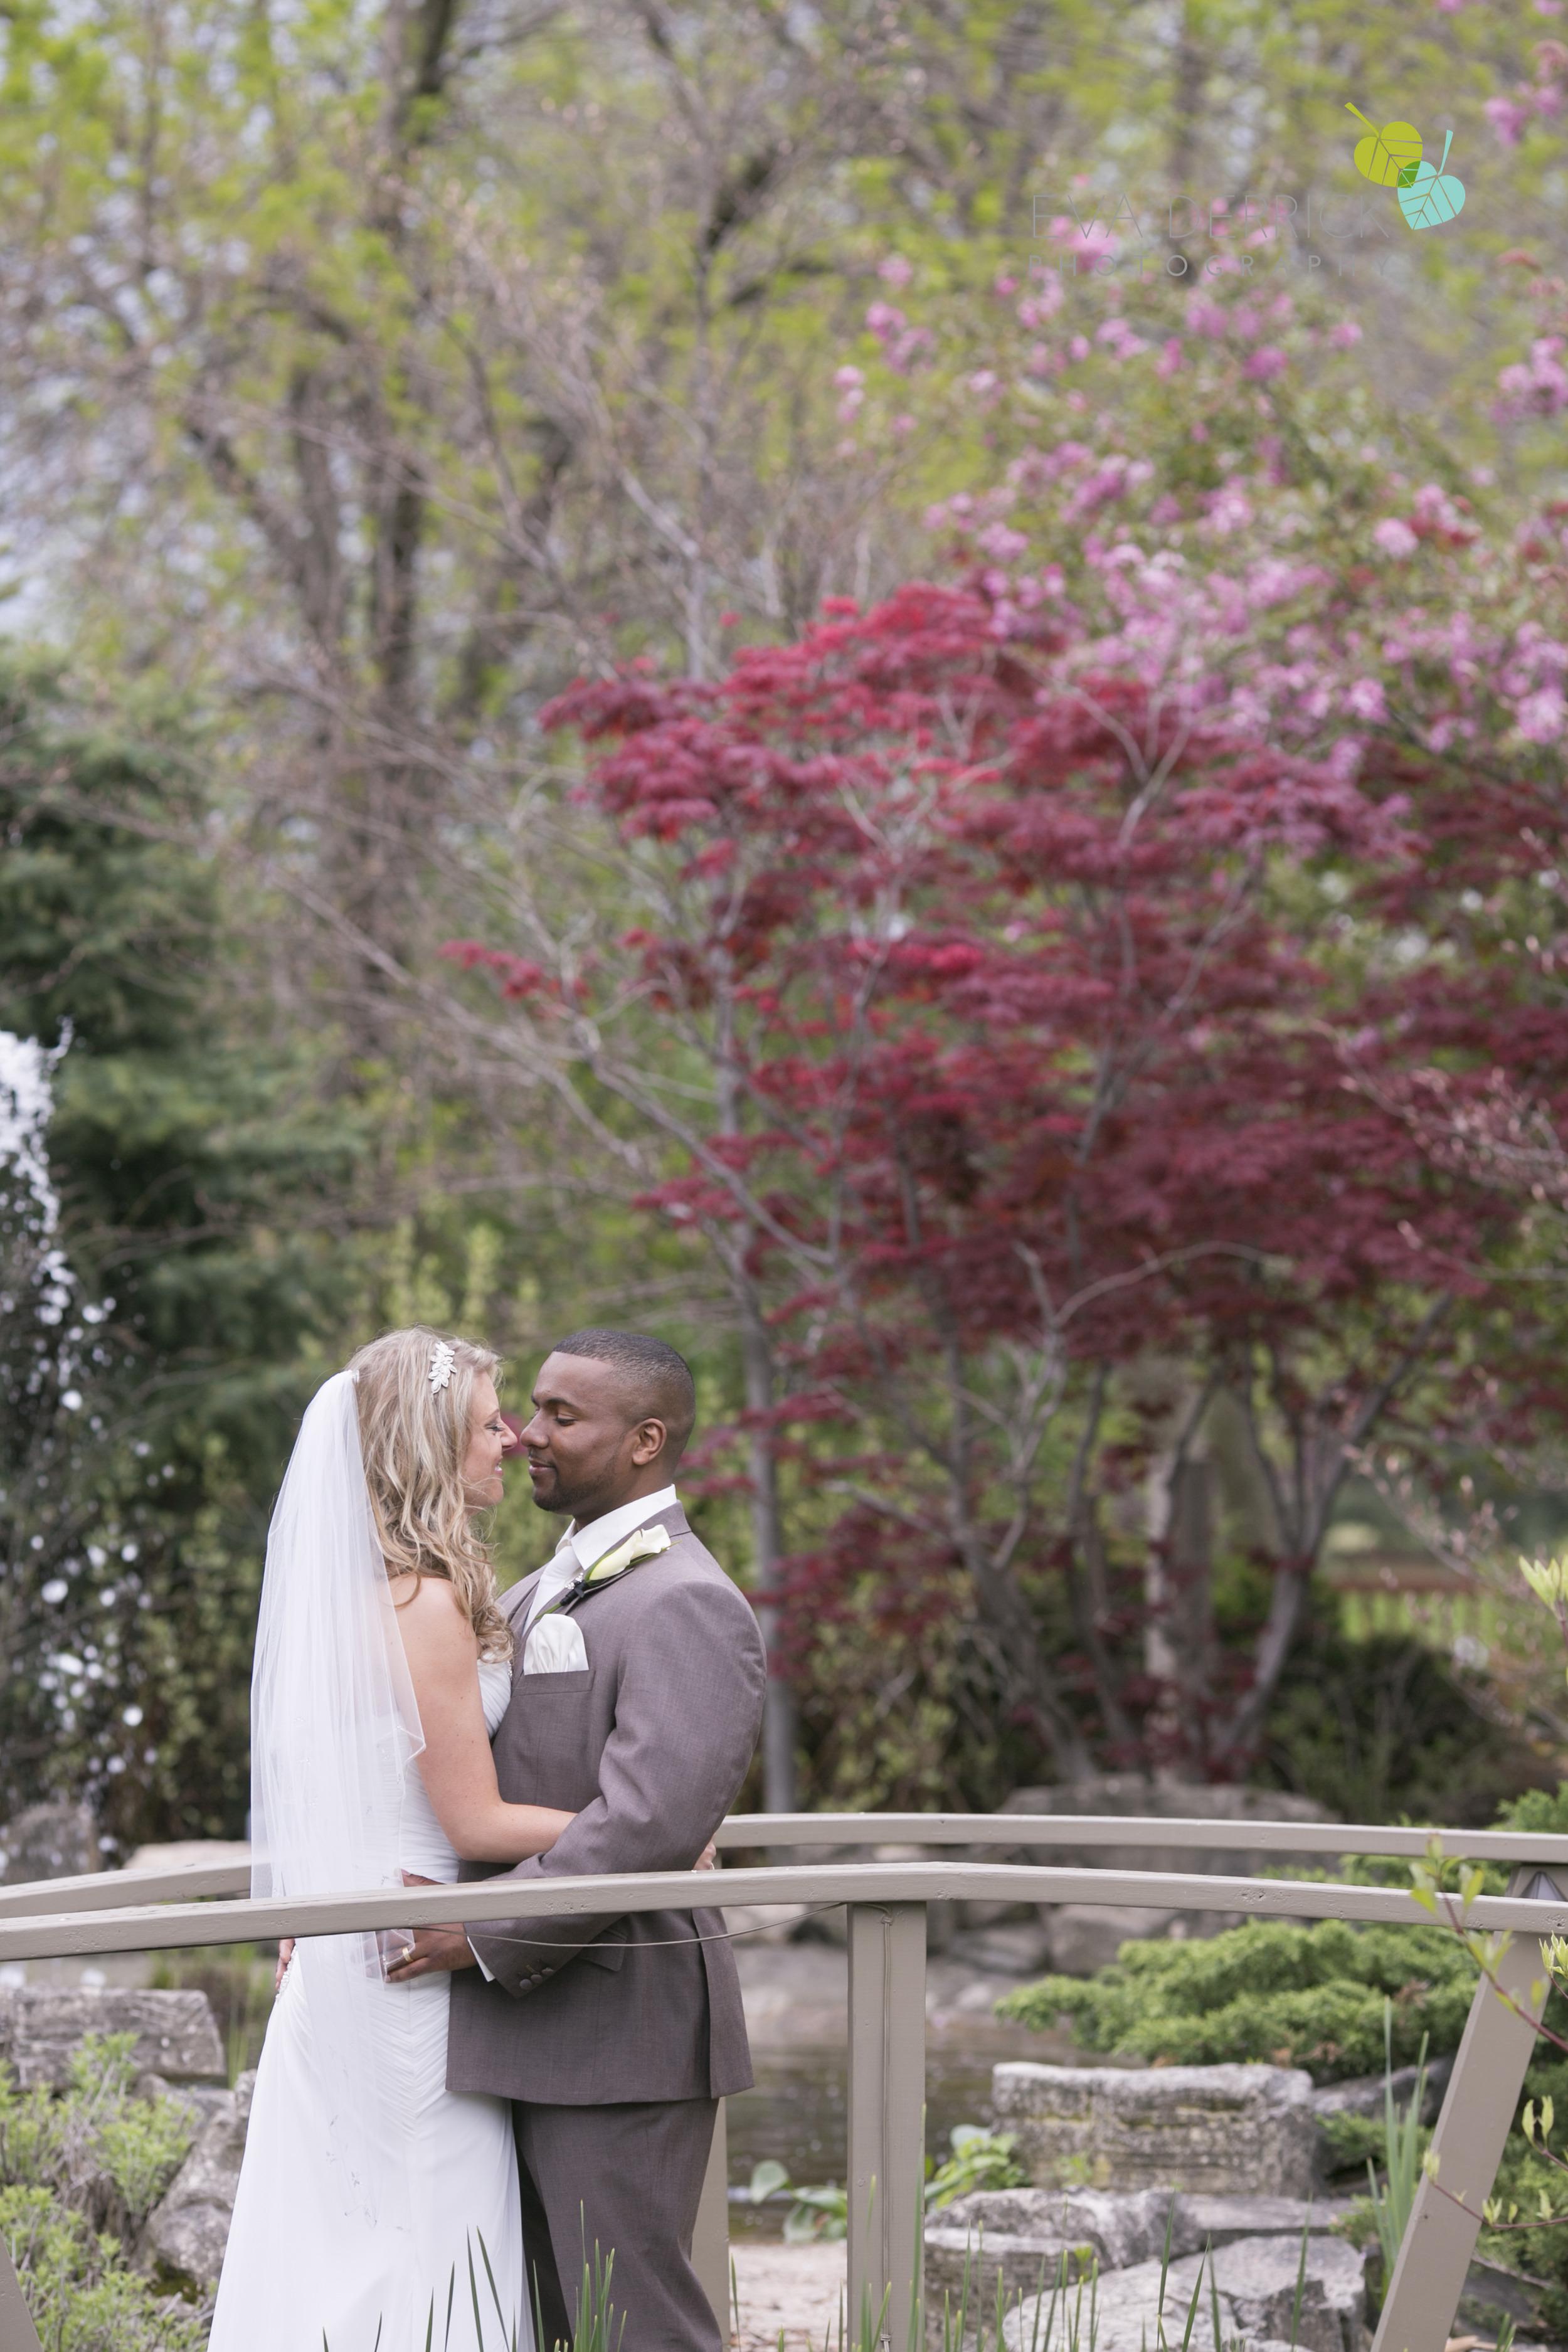 edp_wedding_jenna_chris-0251.jpg